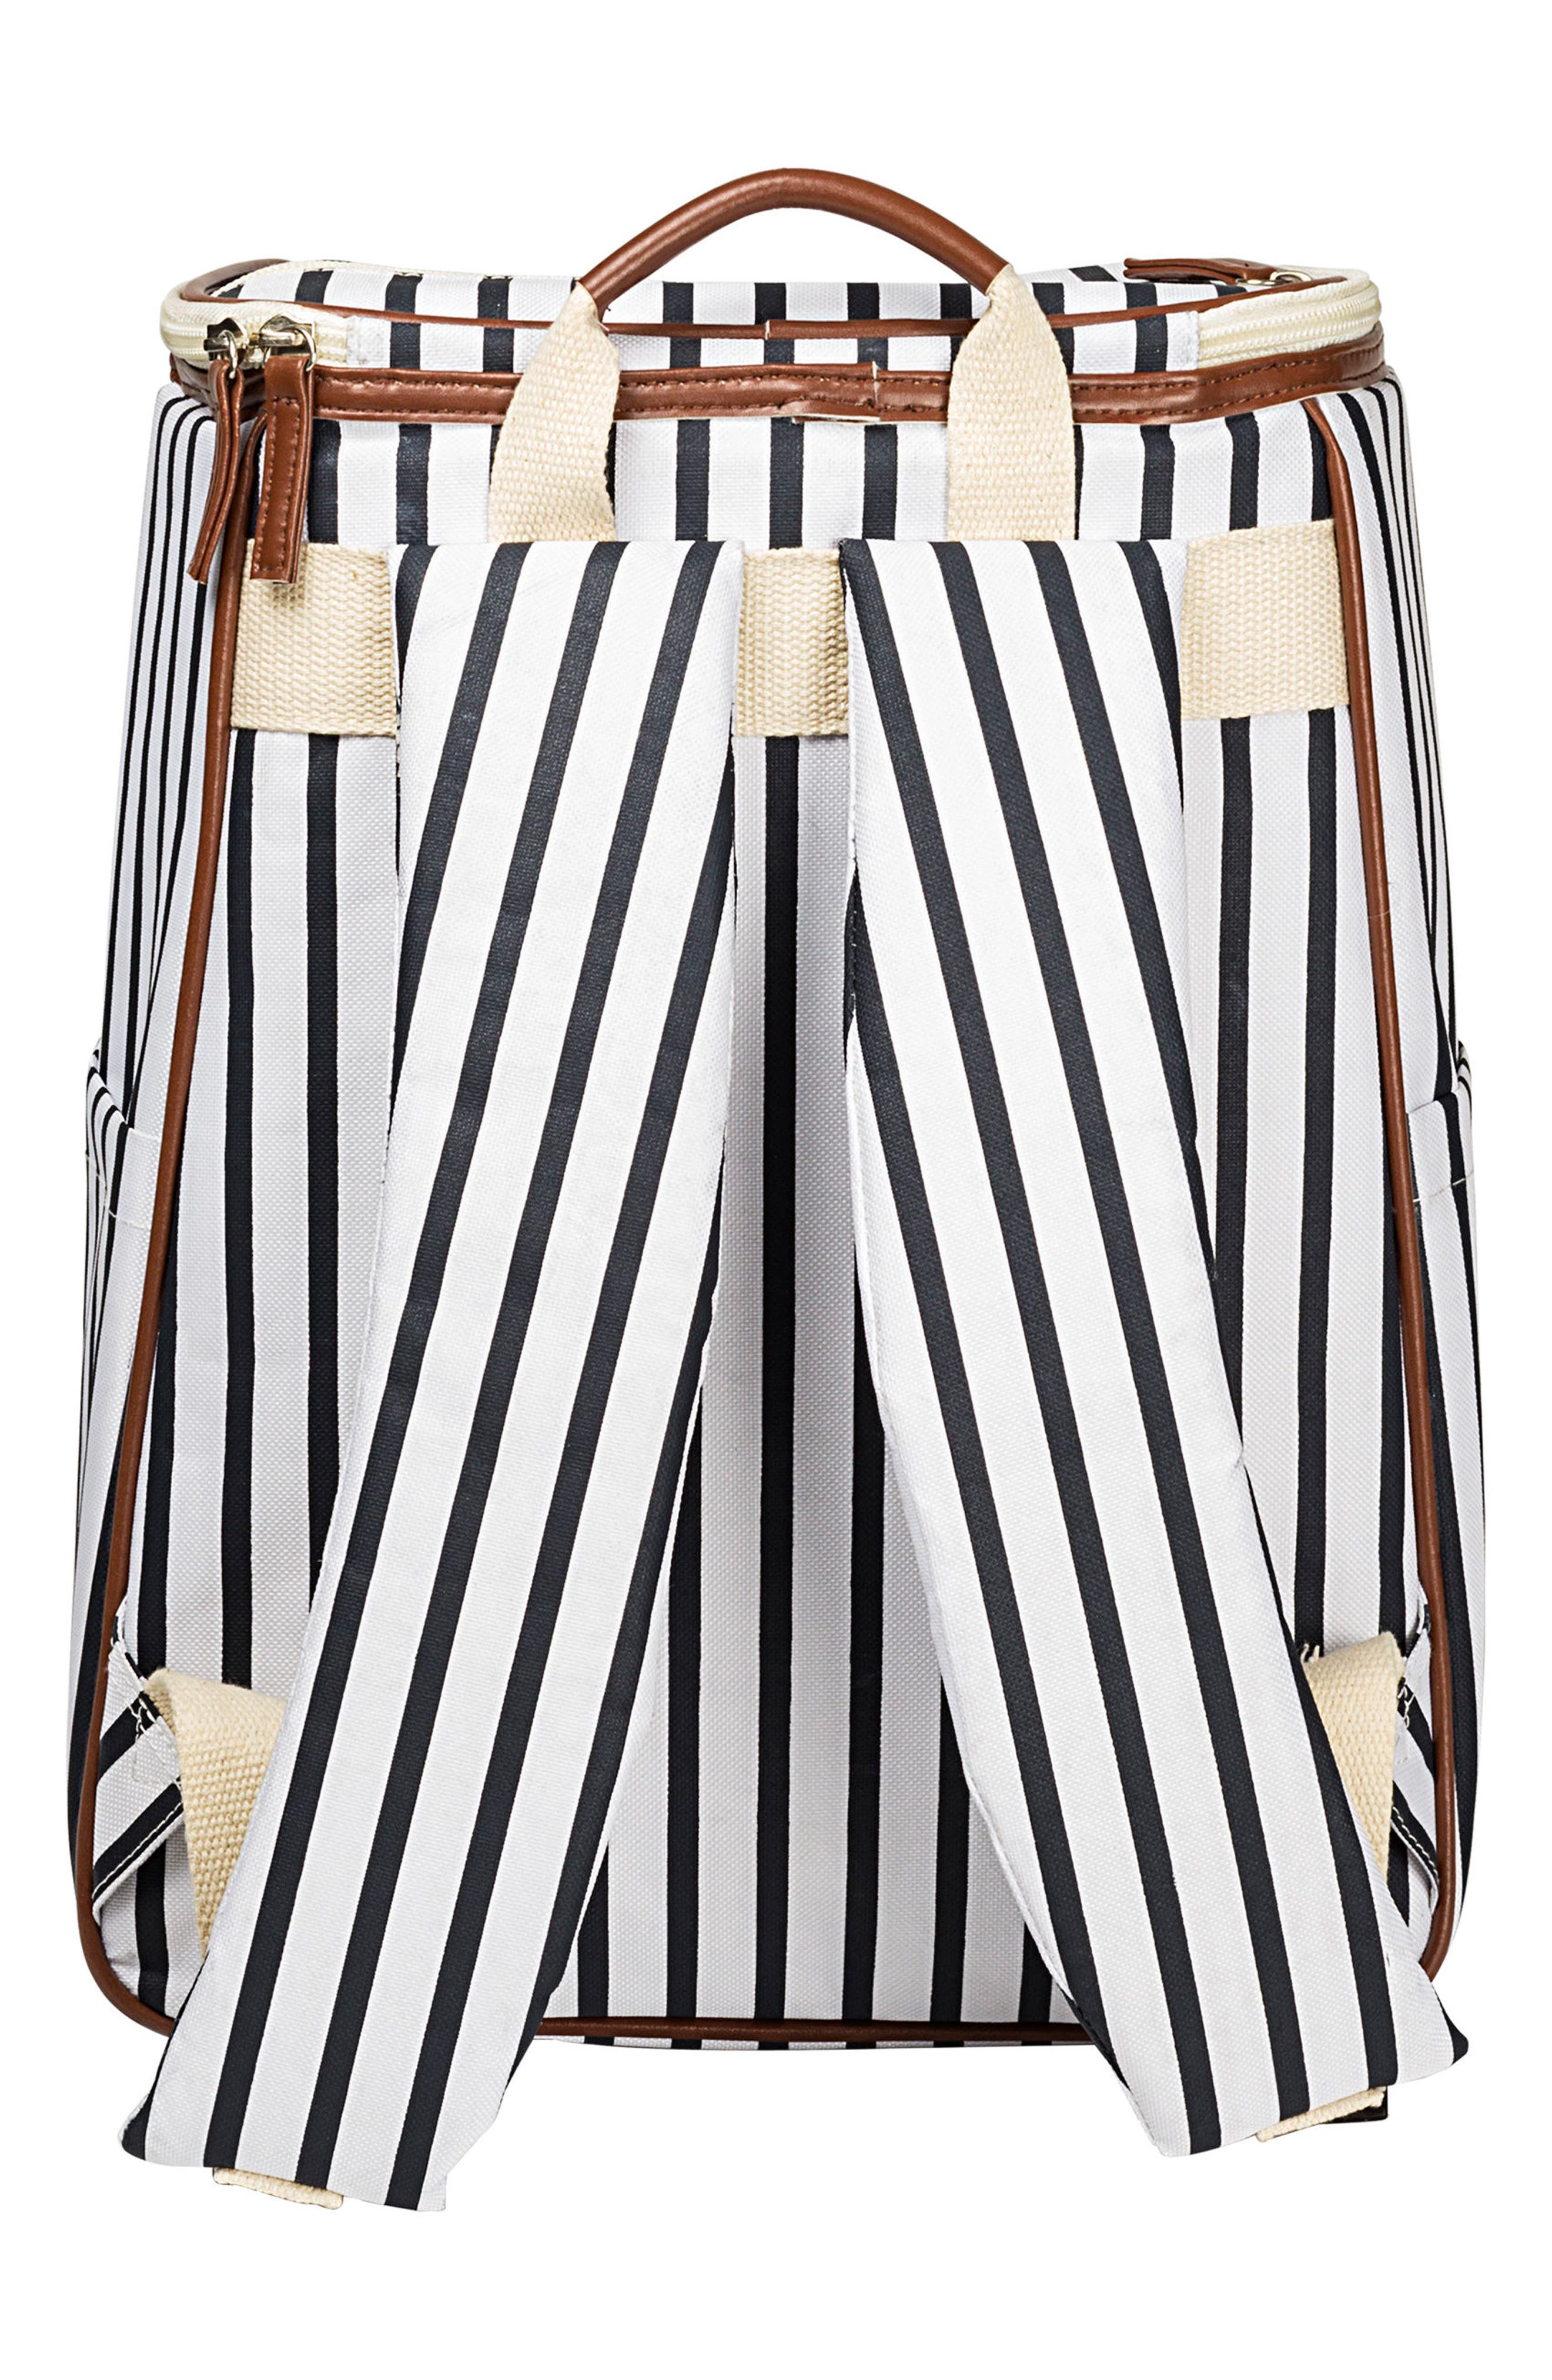 Monogram Stripe Backpack Cooler,                             Alternate thumbnail 3, color,